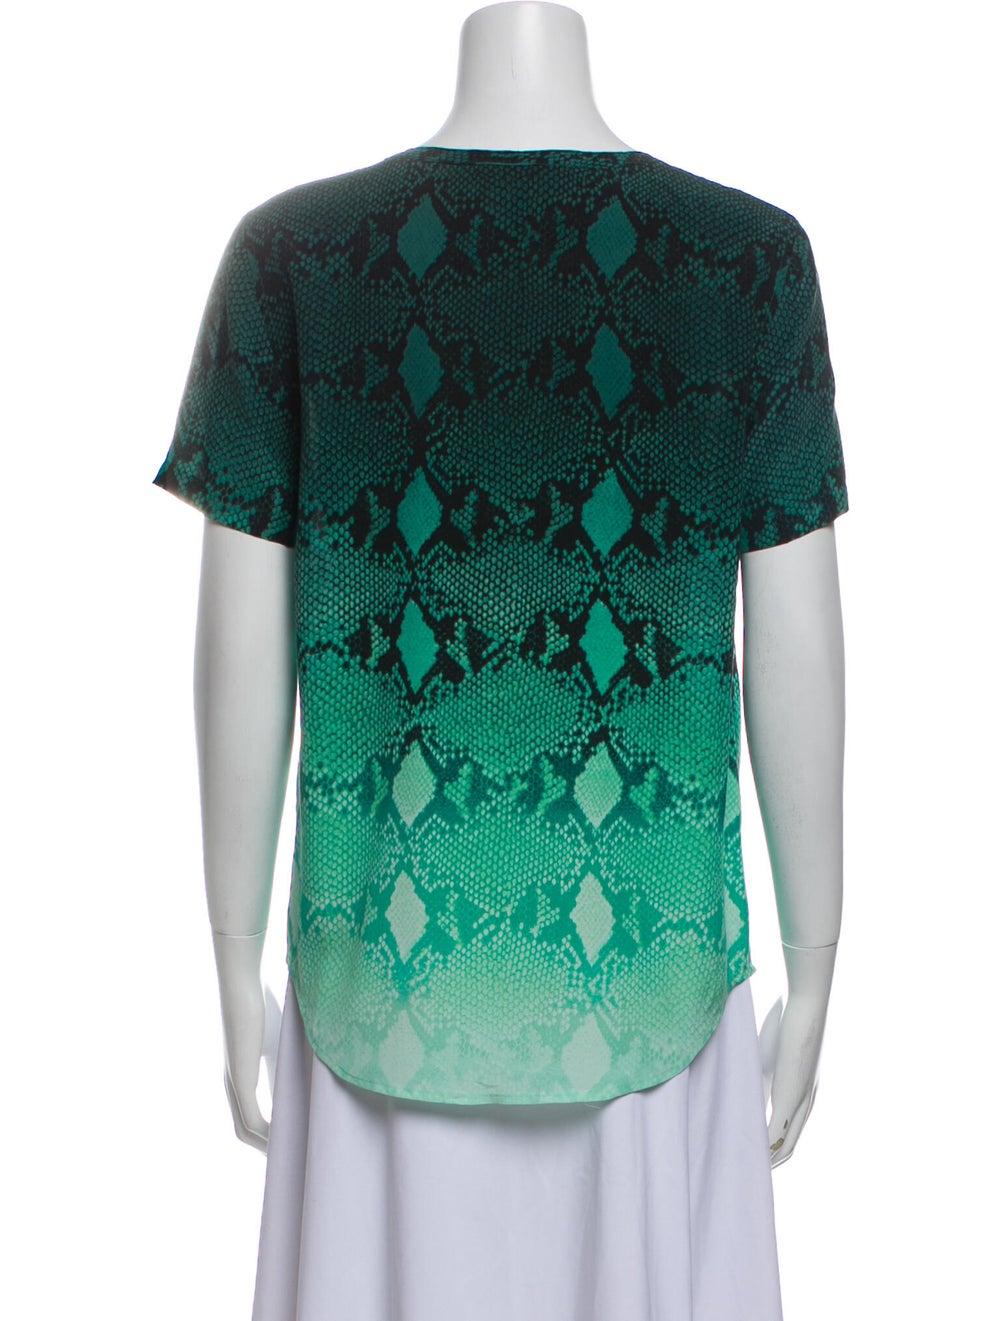 Equipment Silk Animal Print T-Shirt Green - image 3